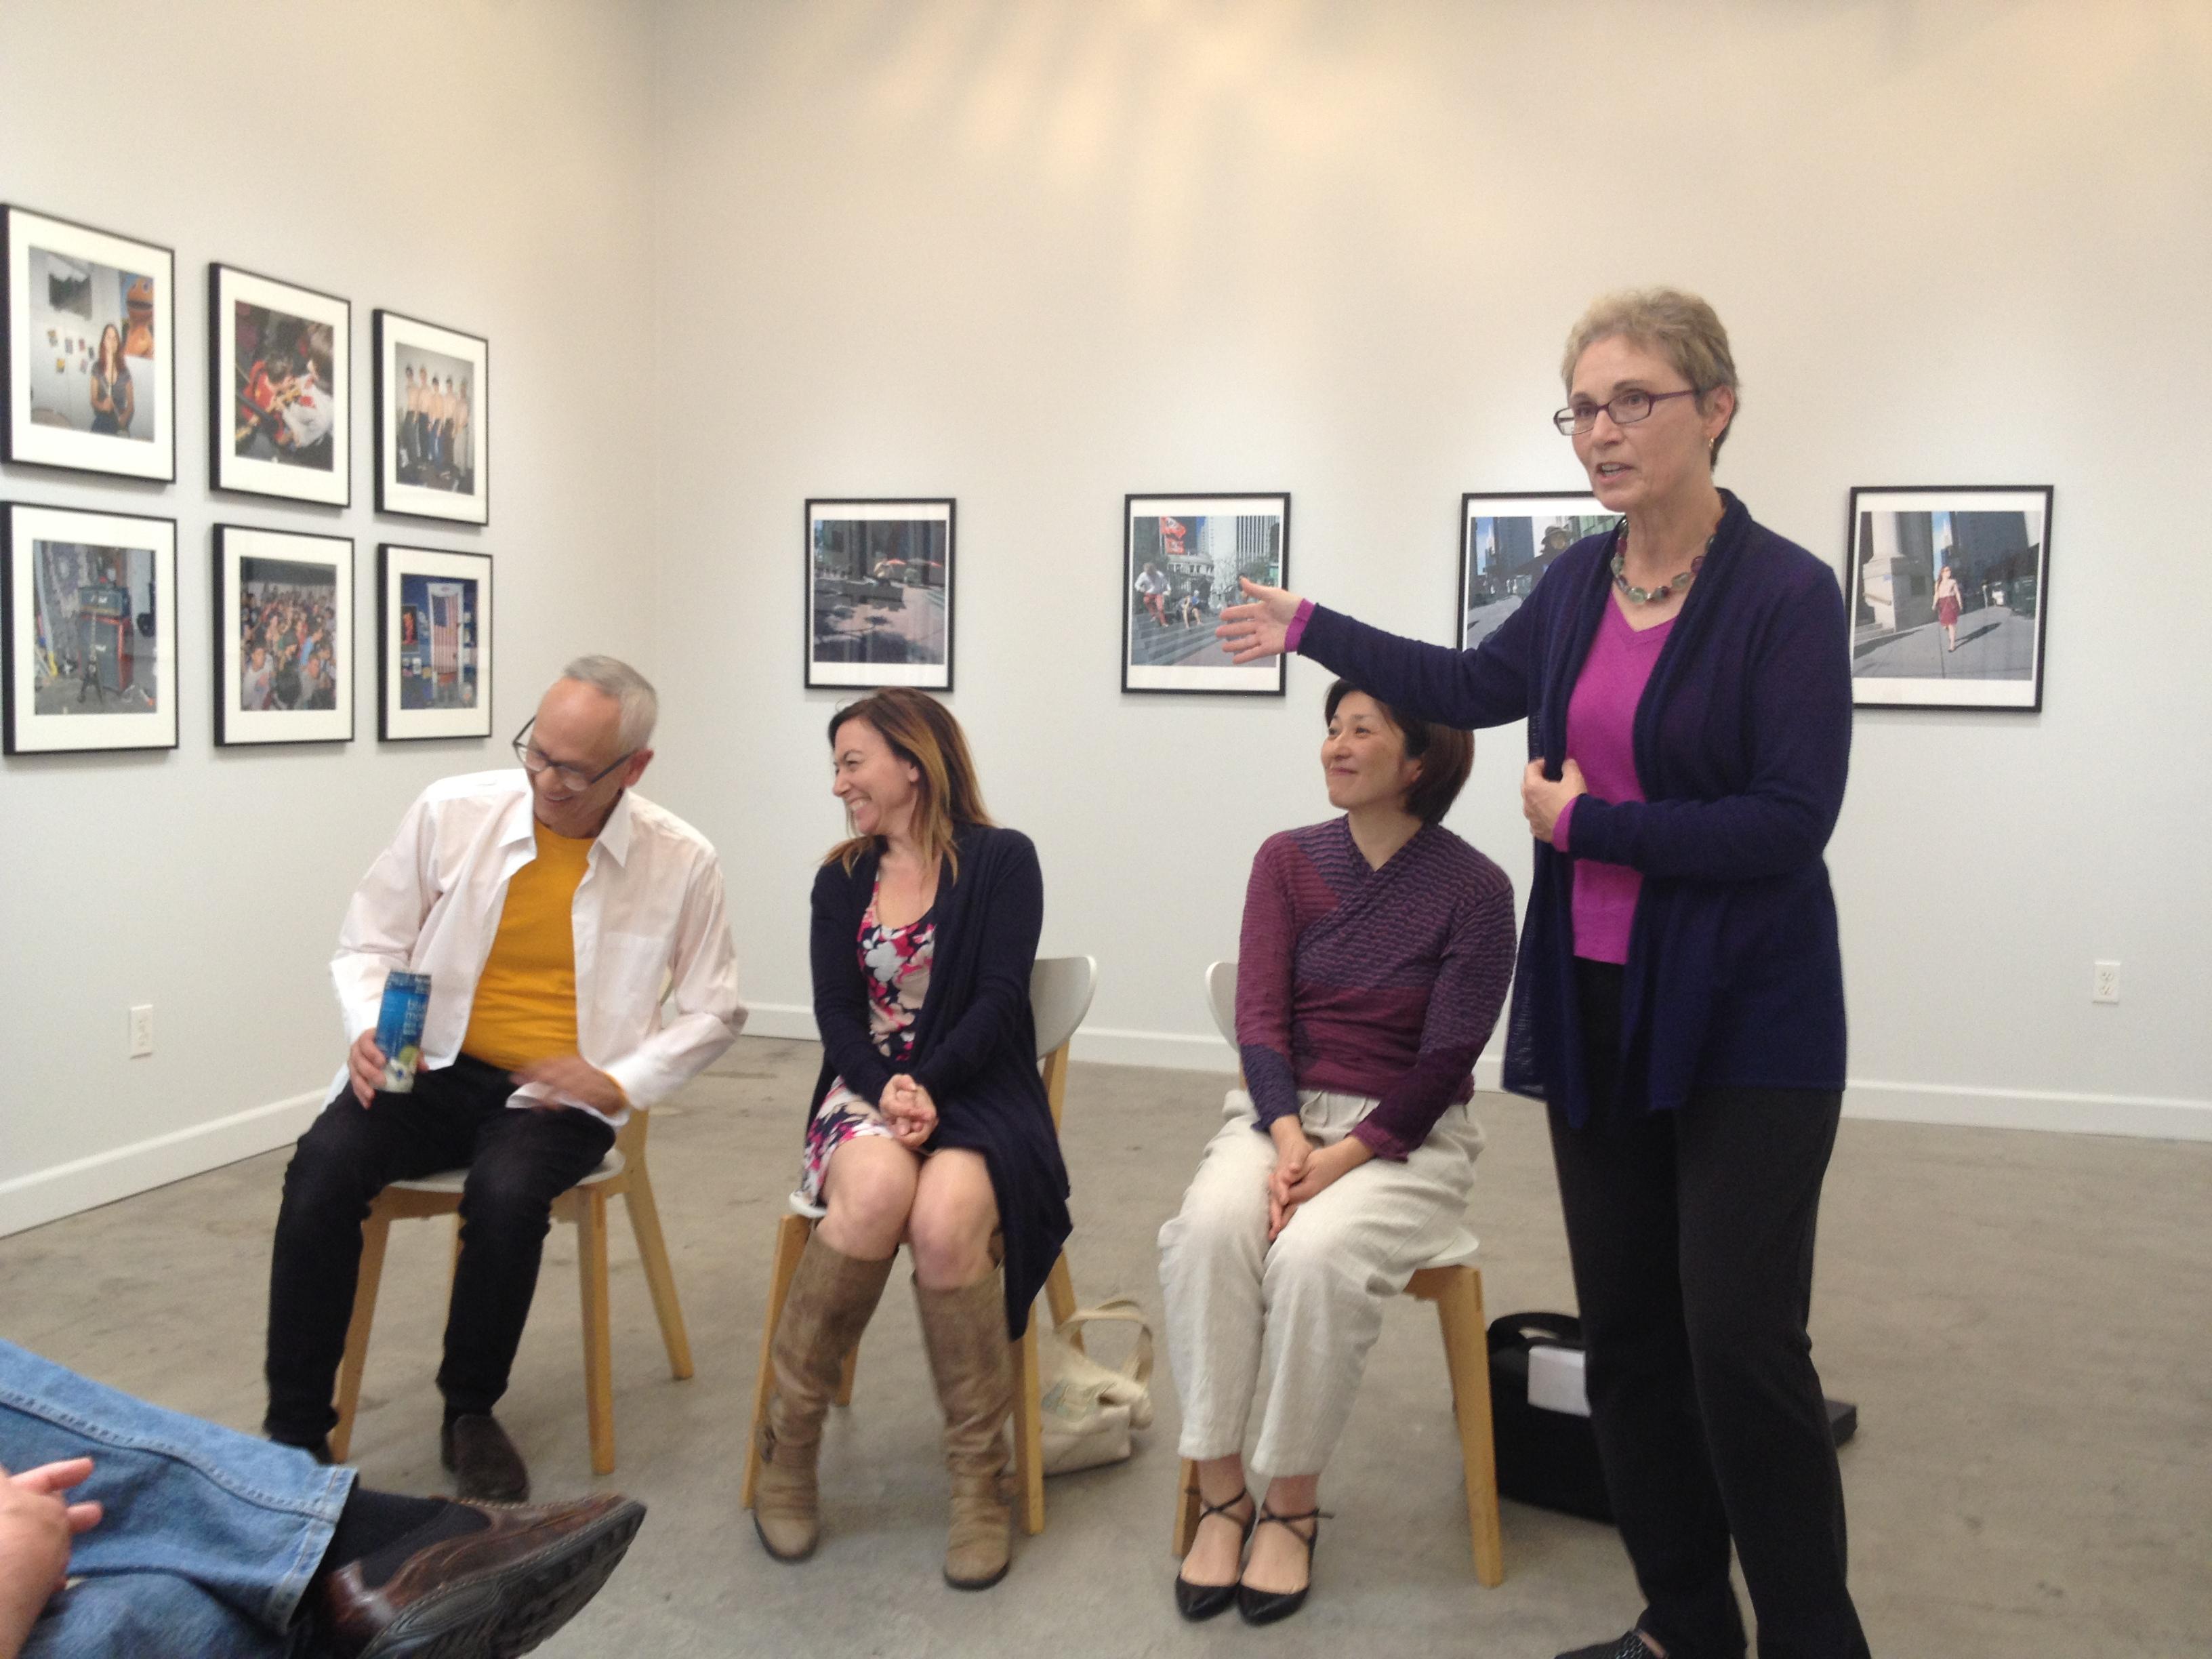 Michael Jang, Ann Jastrab, Hiroyo Kaneko, and Irene Imfeld at PHOTO, Oakland, 2015